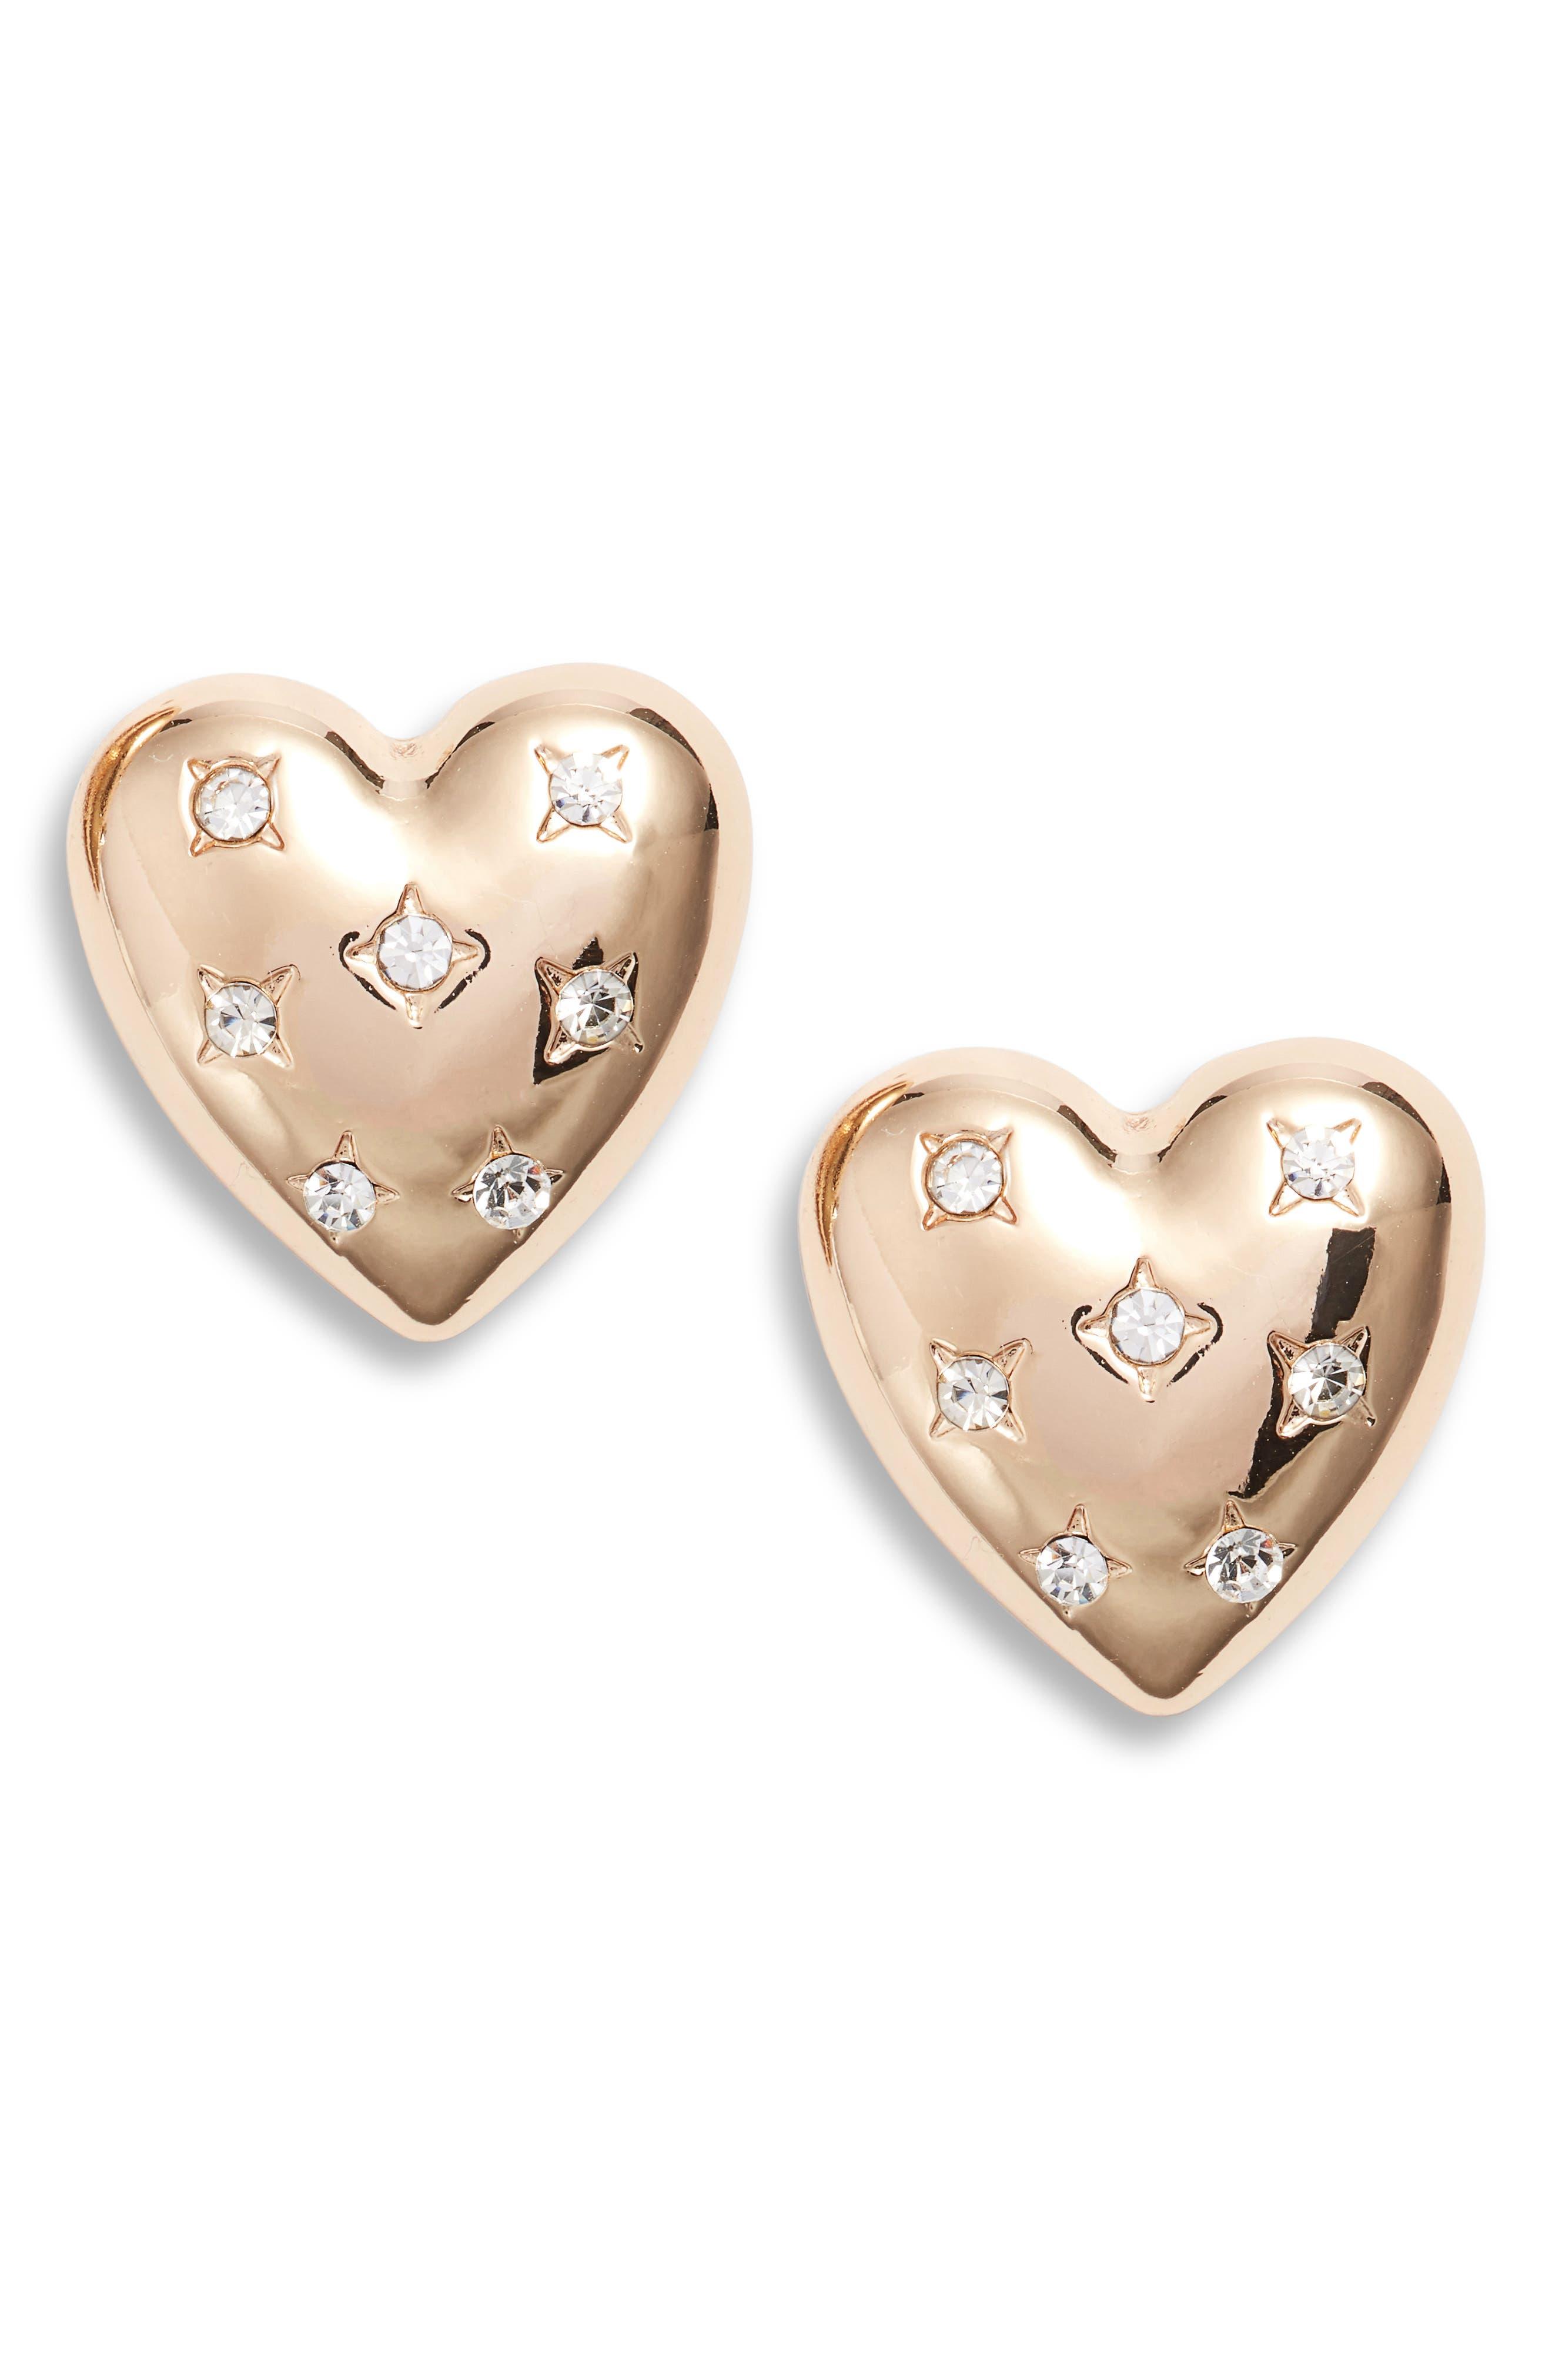 Crystal Heart Stud Earrings,                             Main thumbnail 1, color,                             GOLD/ CRYSTAL